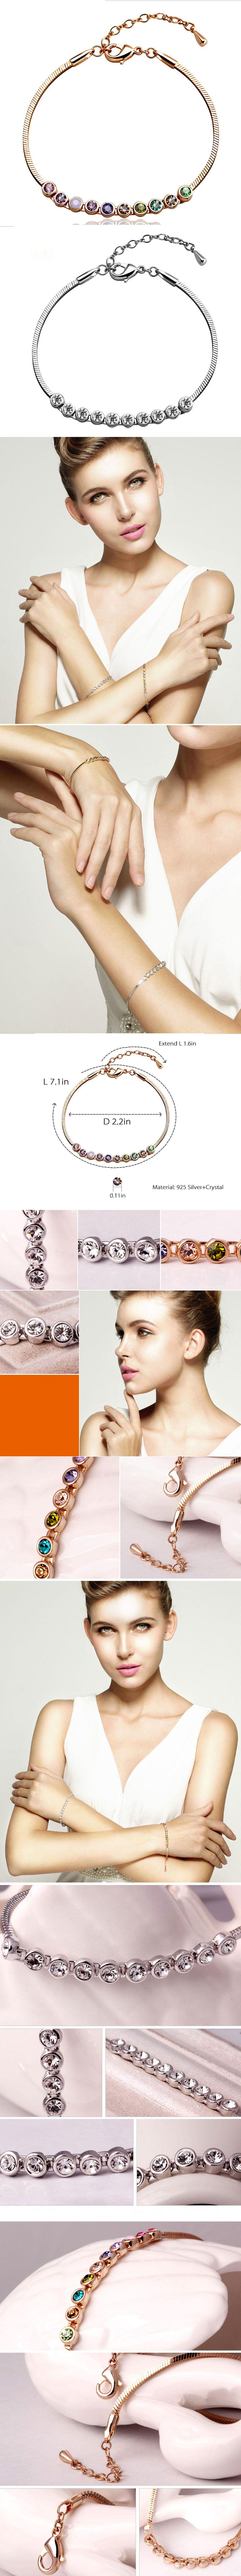 Crystal Bracelet Feline Charm